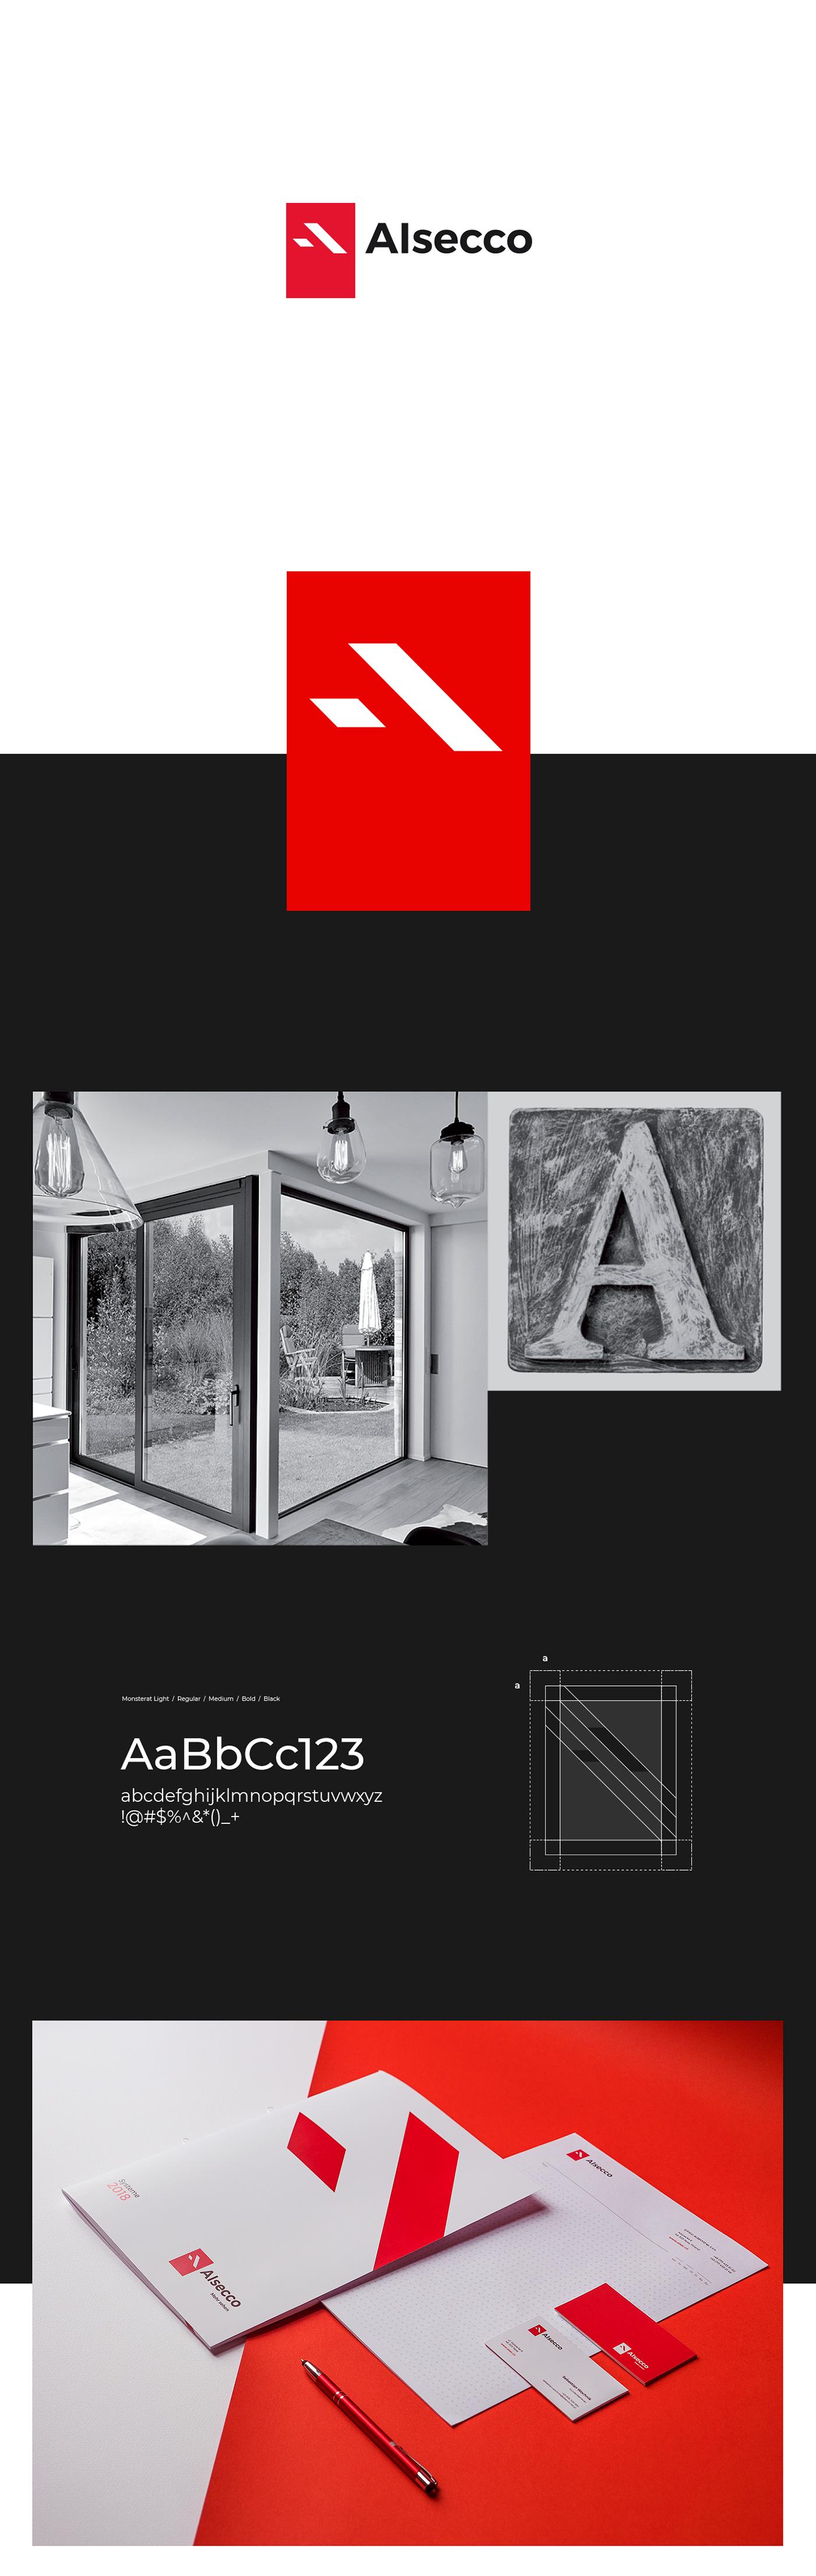 windows factory door alsecco red geometry minimal product home